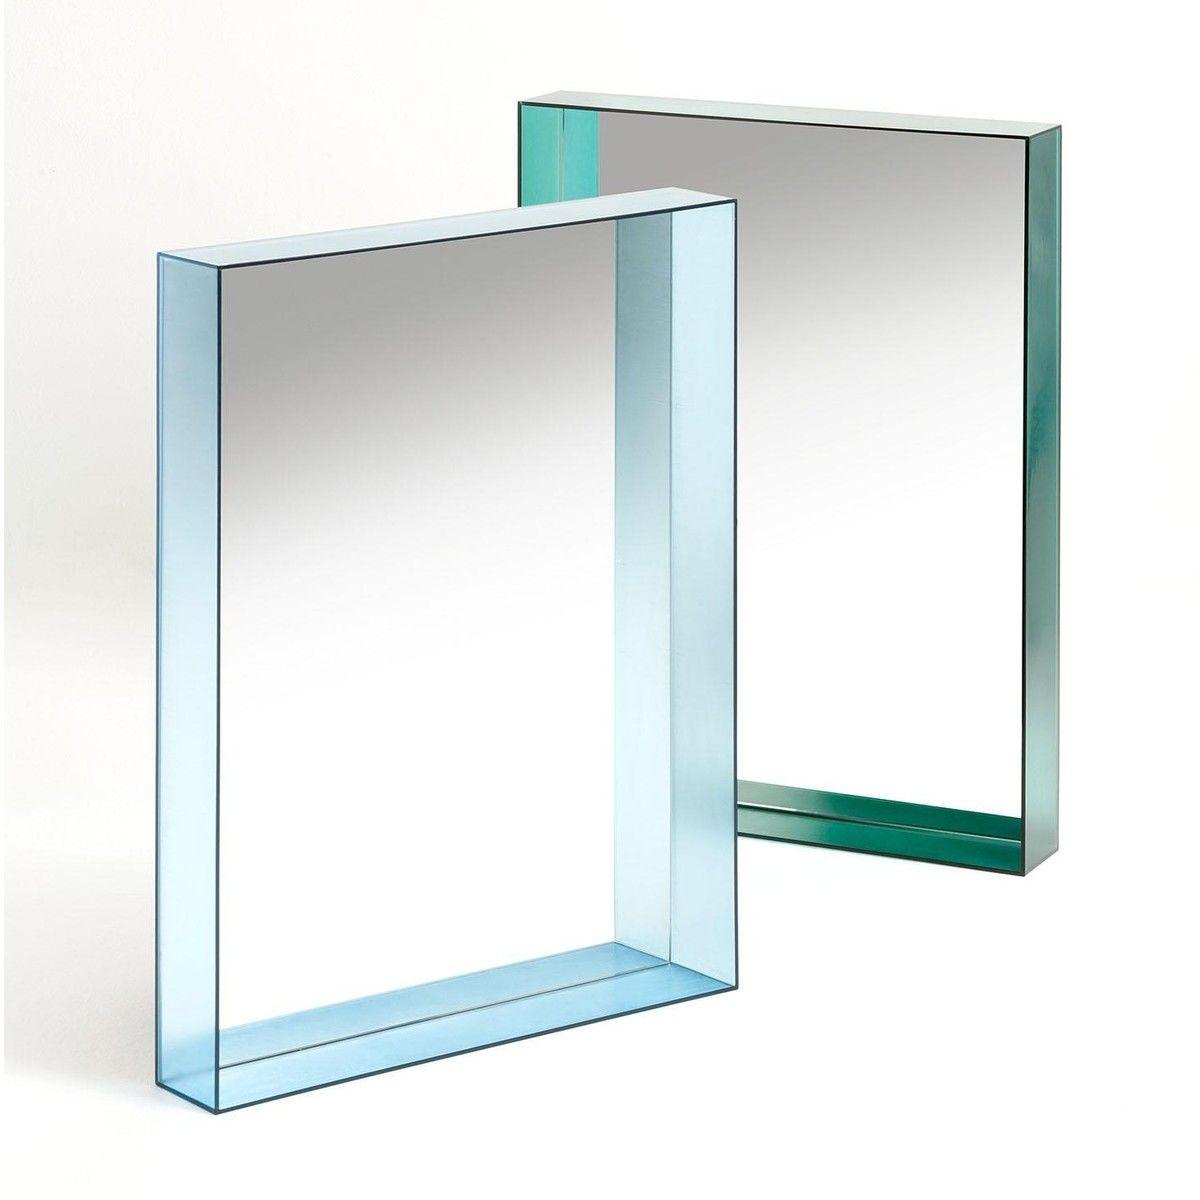 only me mirror x  kartell  ambientedirectcom - kartell  only me mirror x